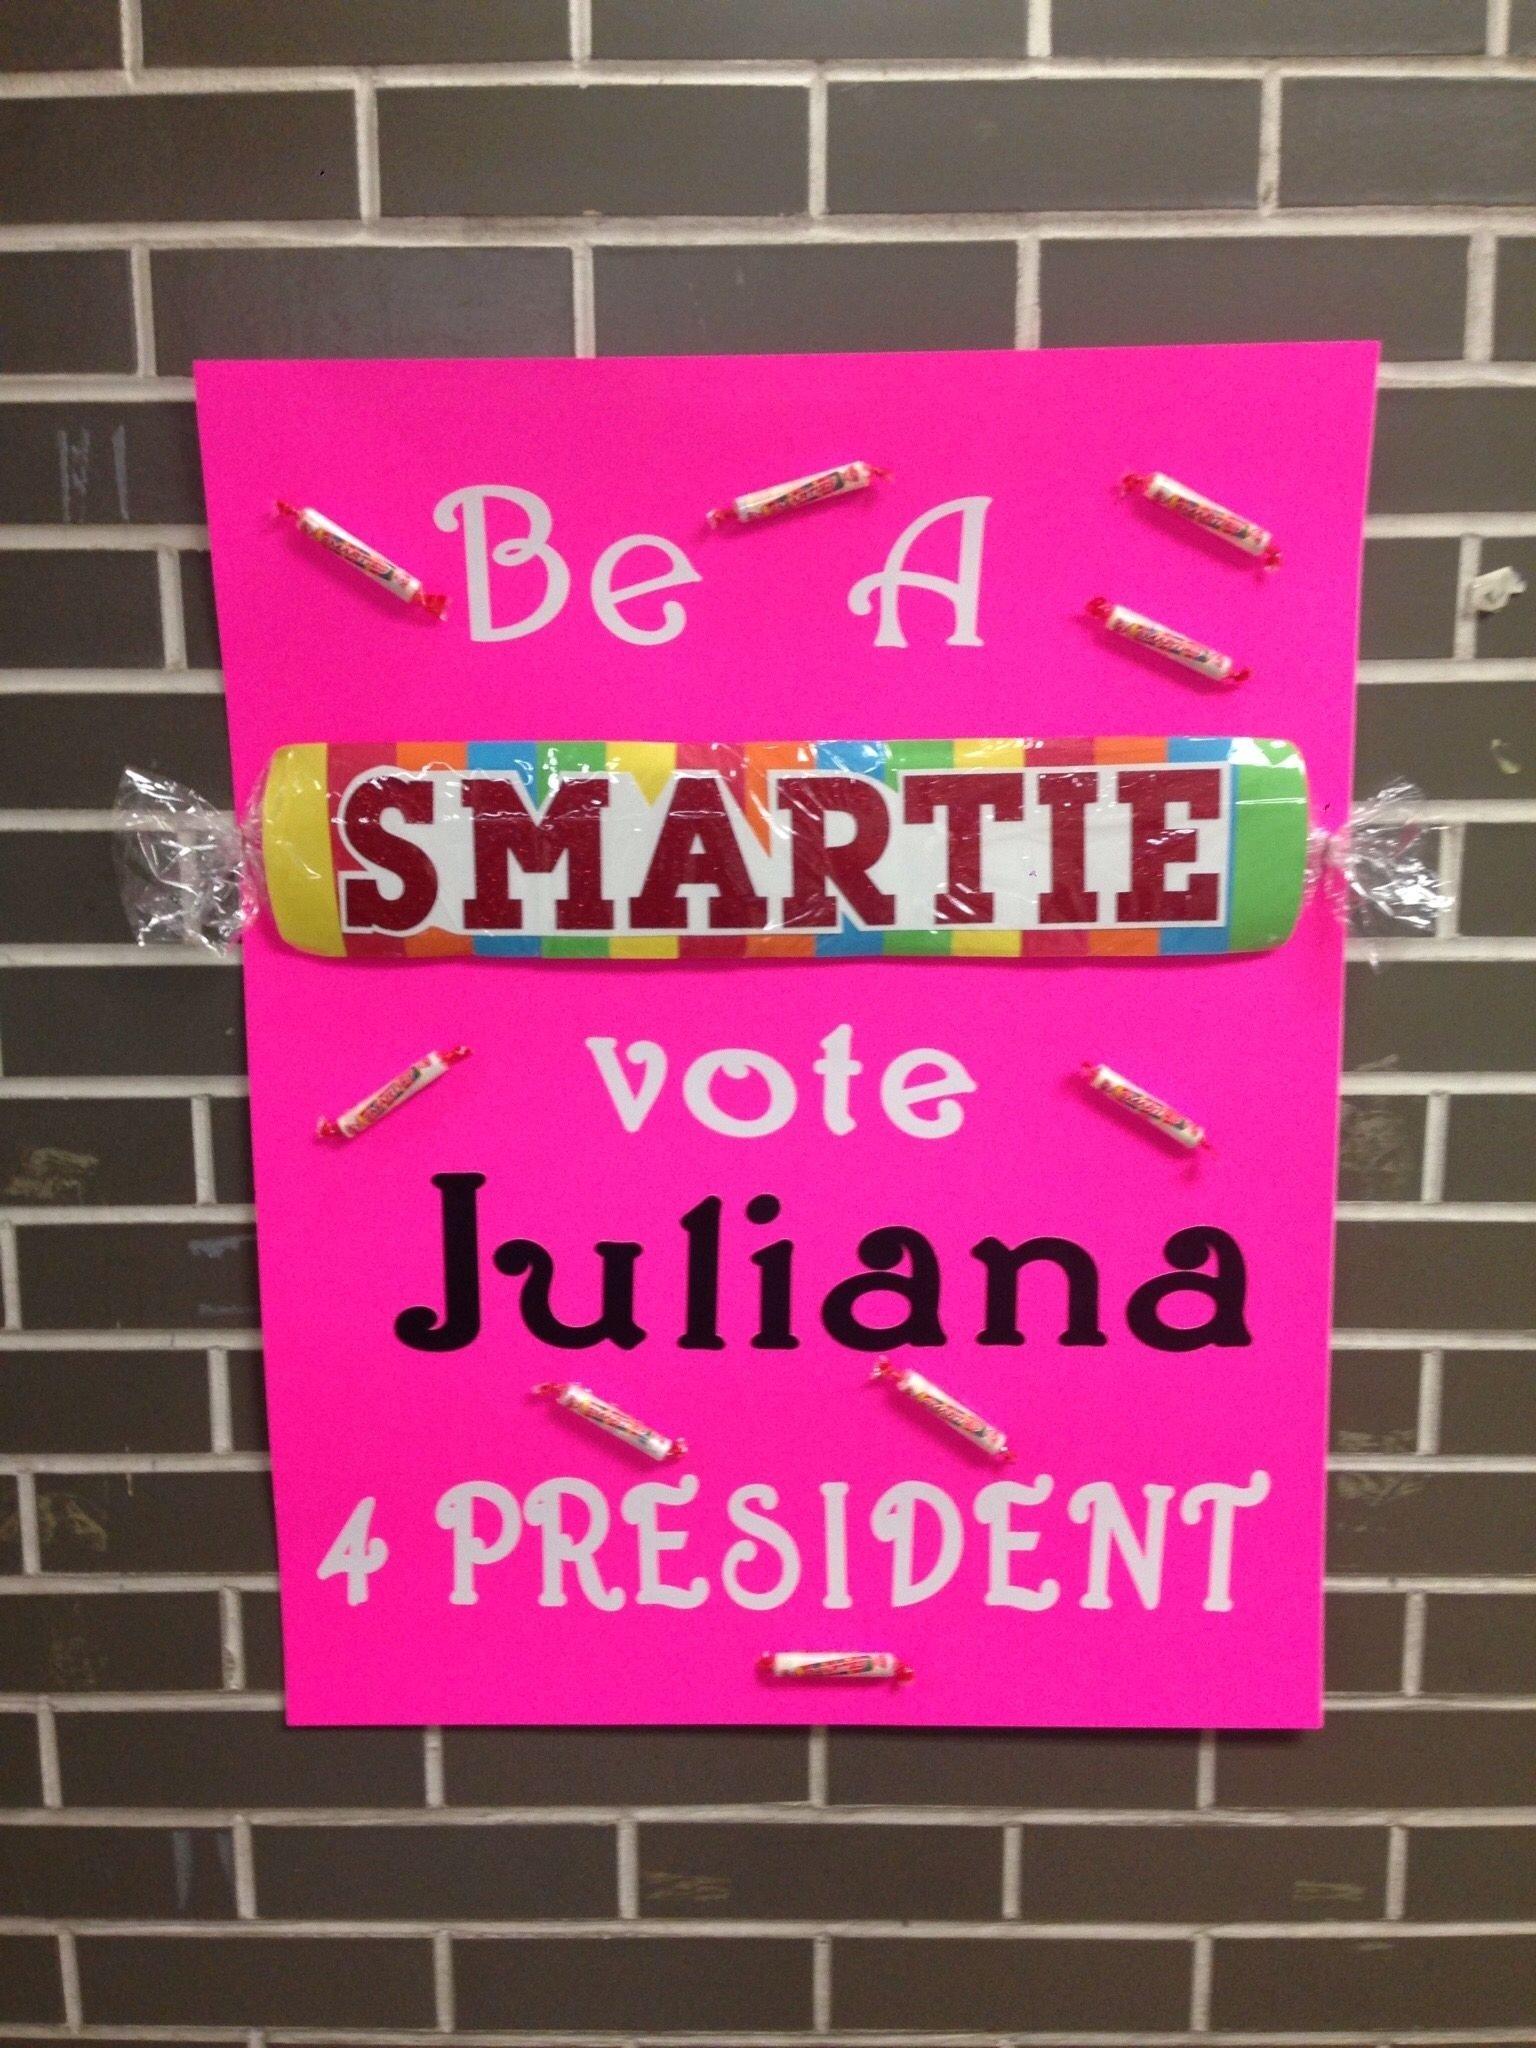 10 Fantastic Elementary School Student Council Ideas student council election poster juliana pinterest students 5 2021